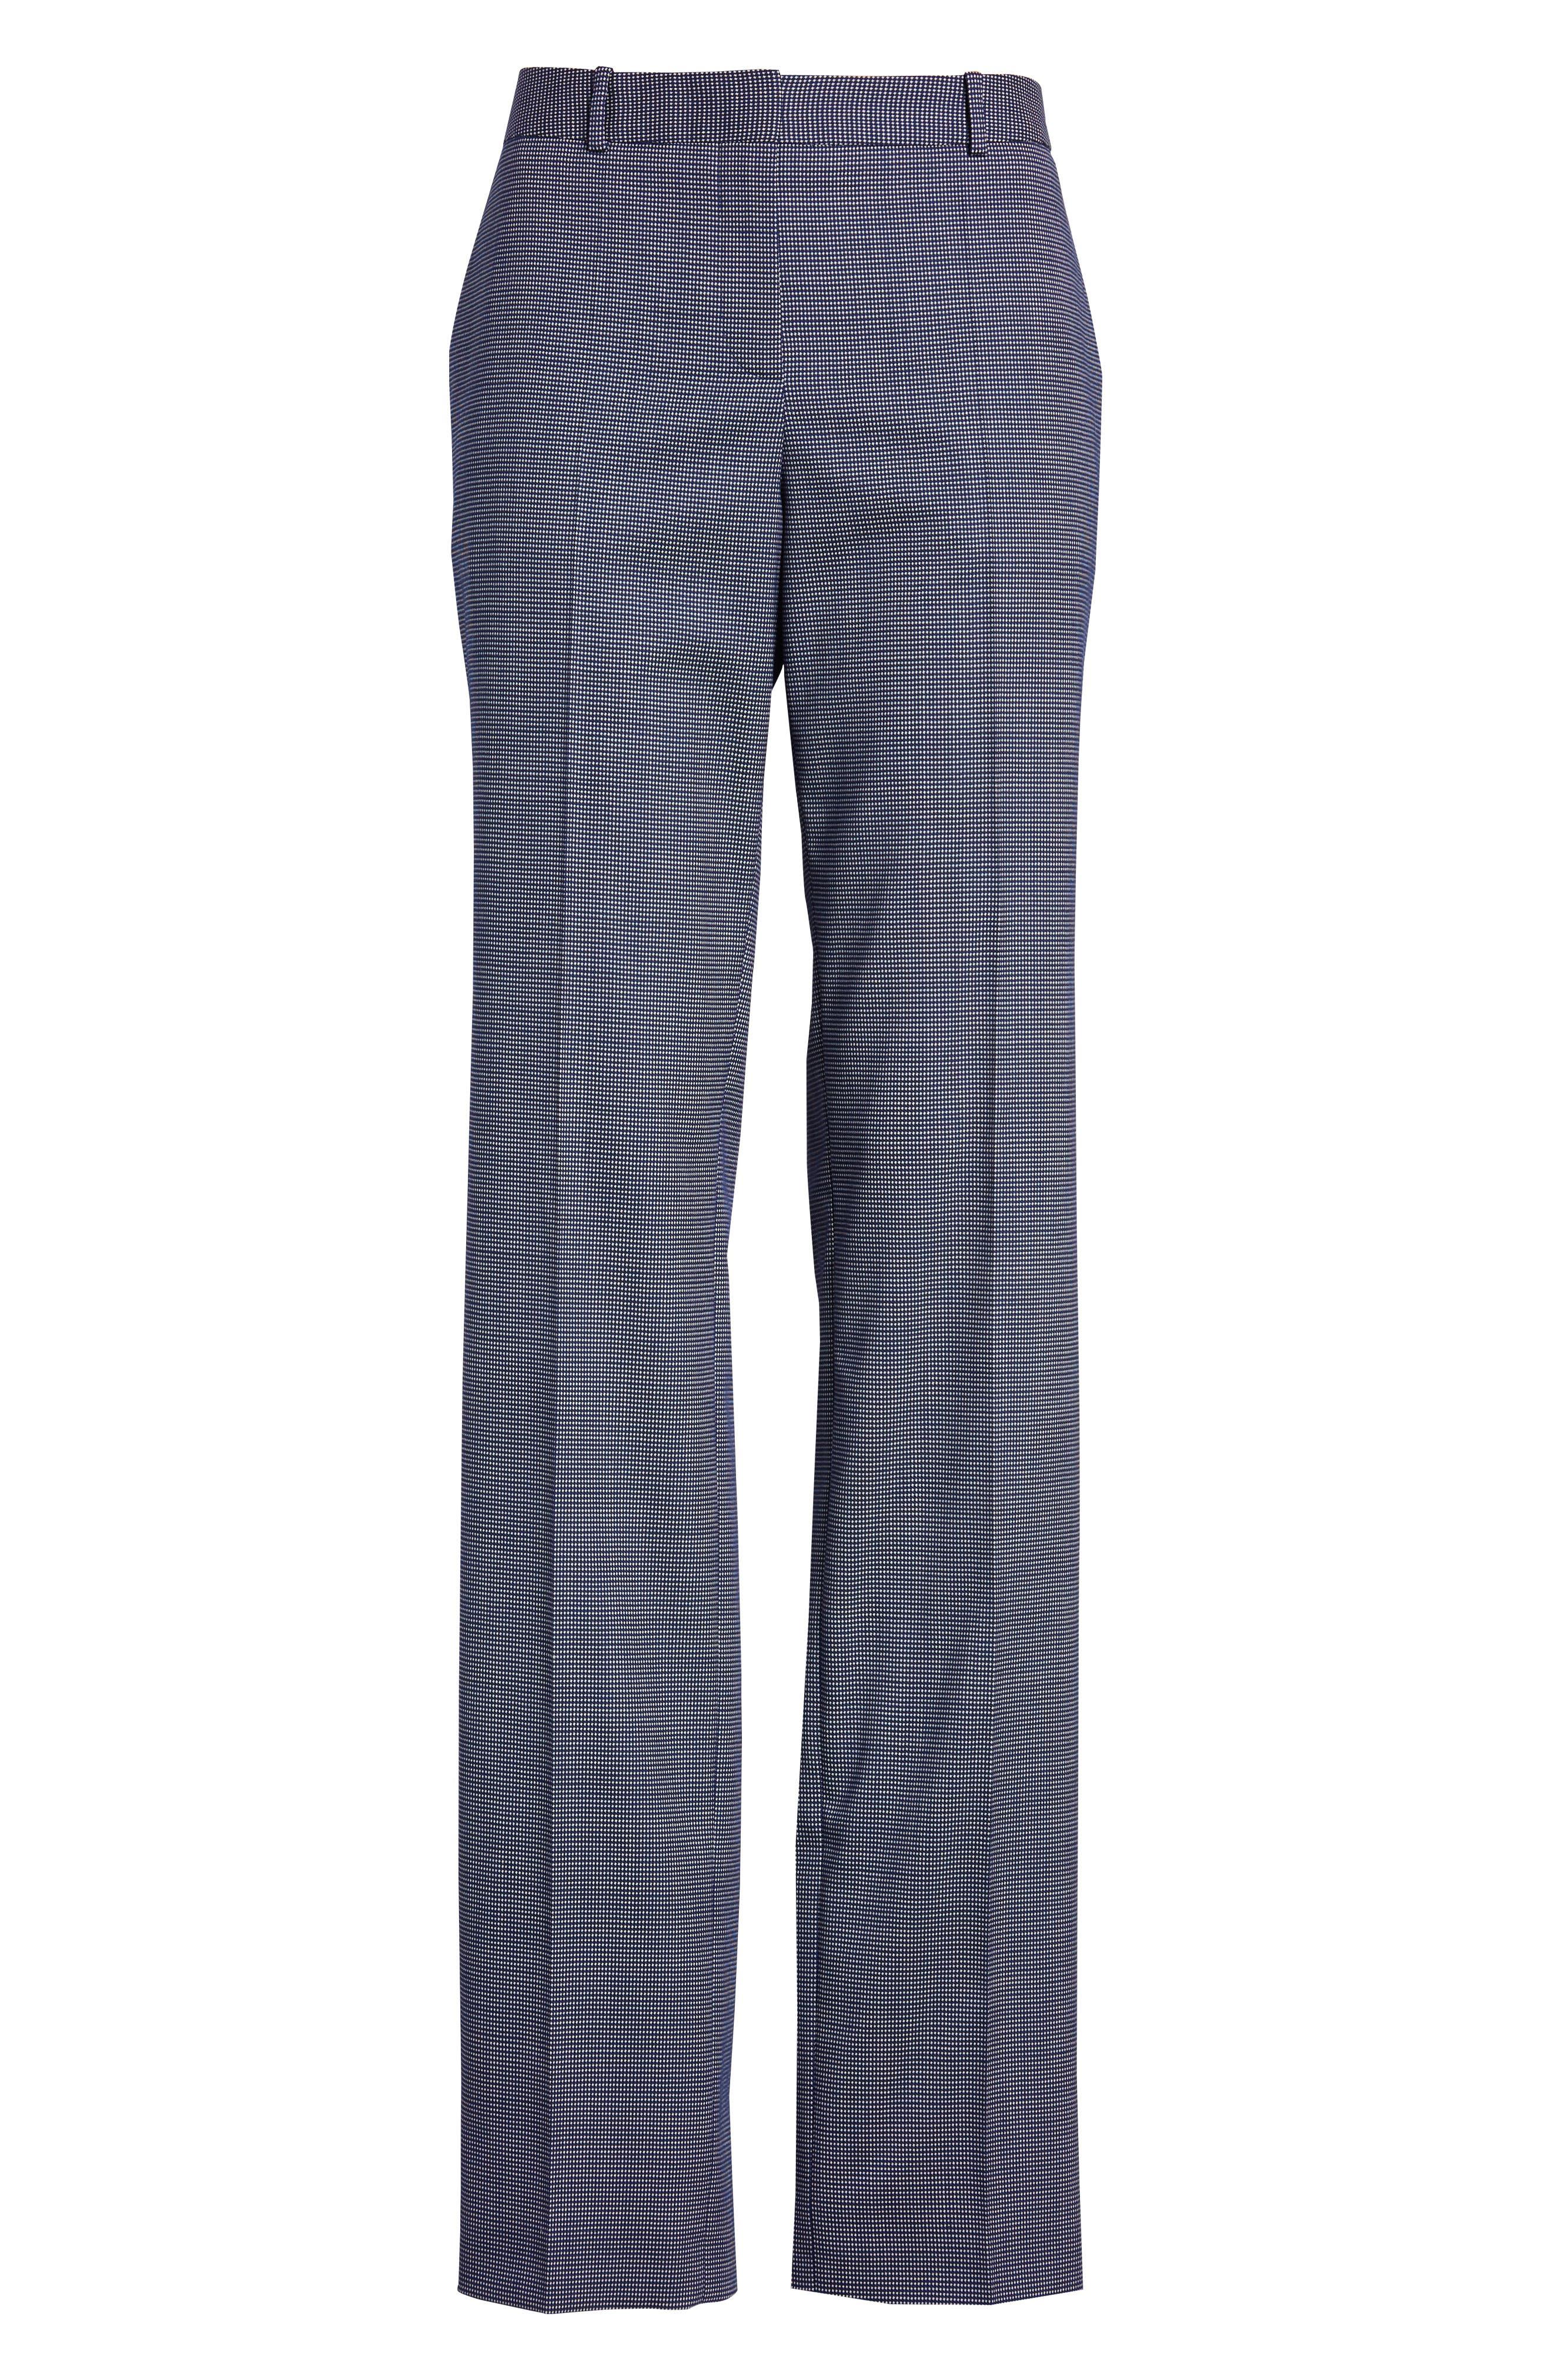 Tamea Minidessin Suit Pants,                             Alternate thumbnail 7, color,                             Blue Fantasy